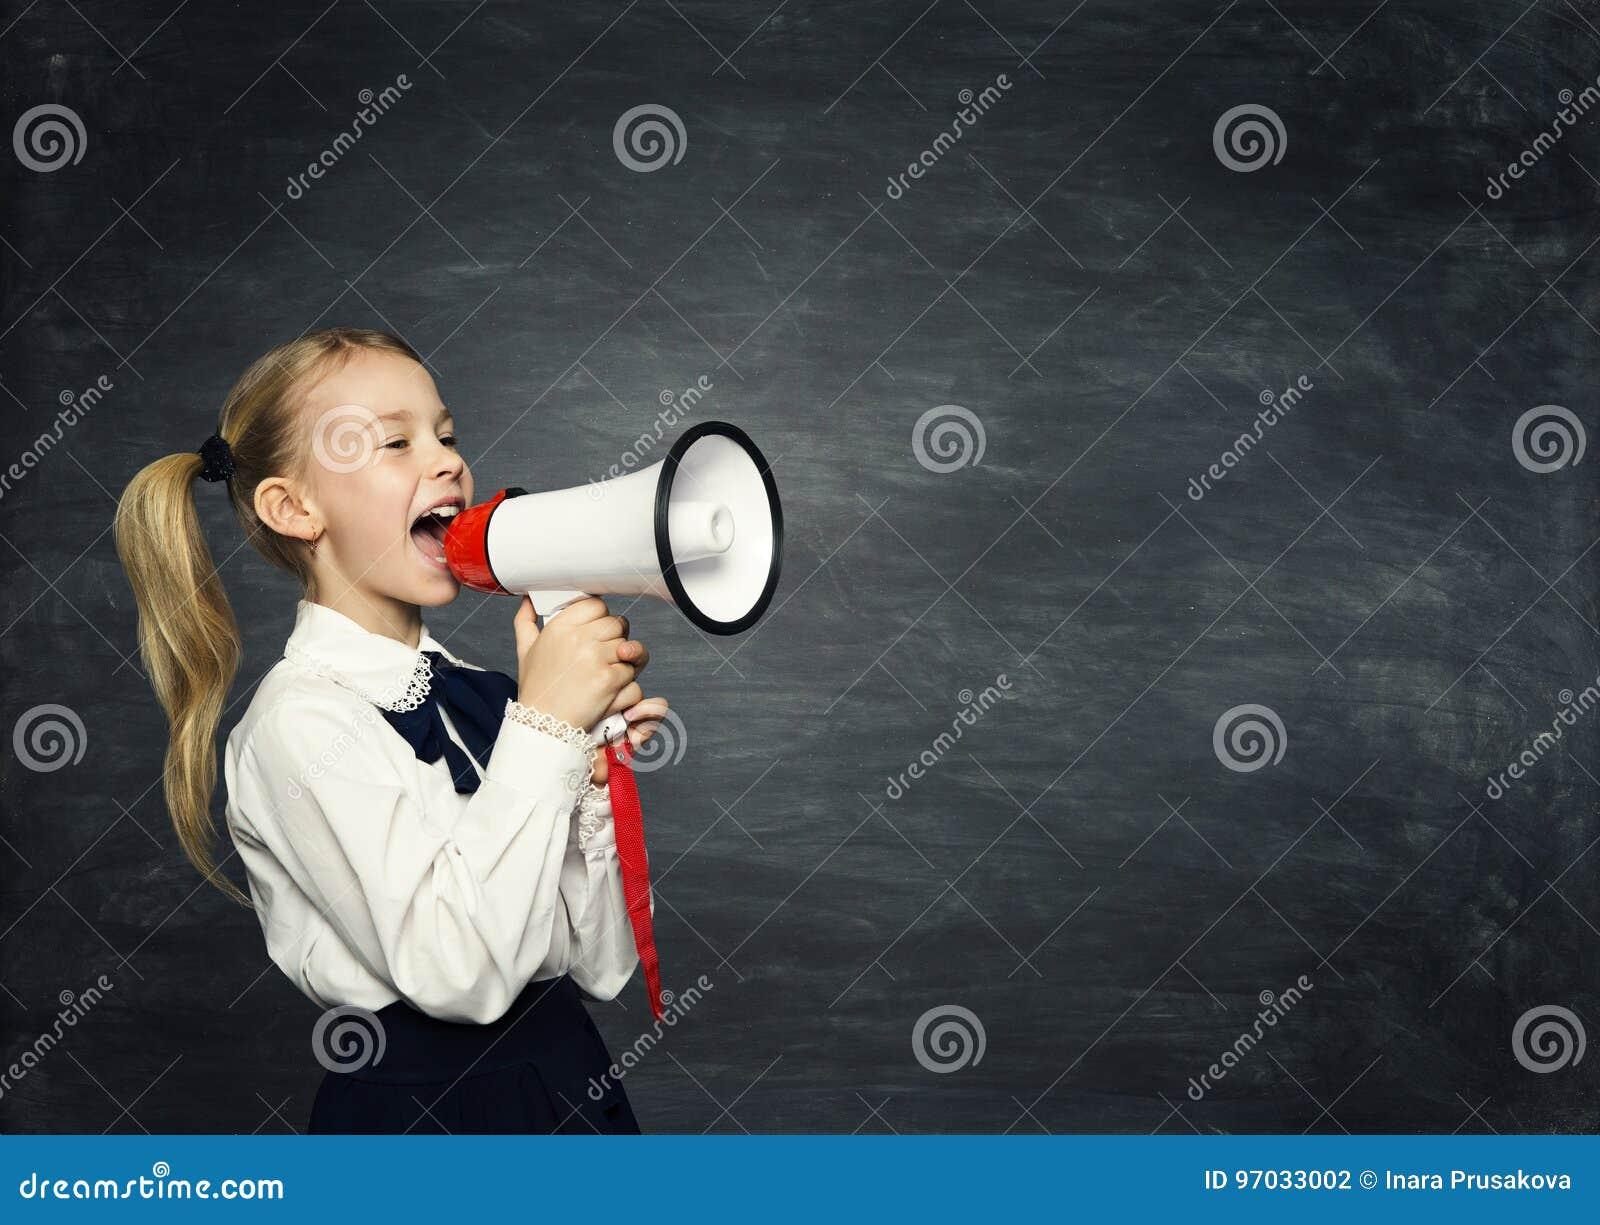 Child Girl Megaphone Announcement, School Kid Announce, Blackboard